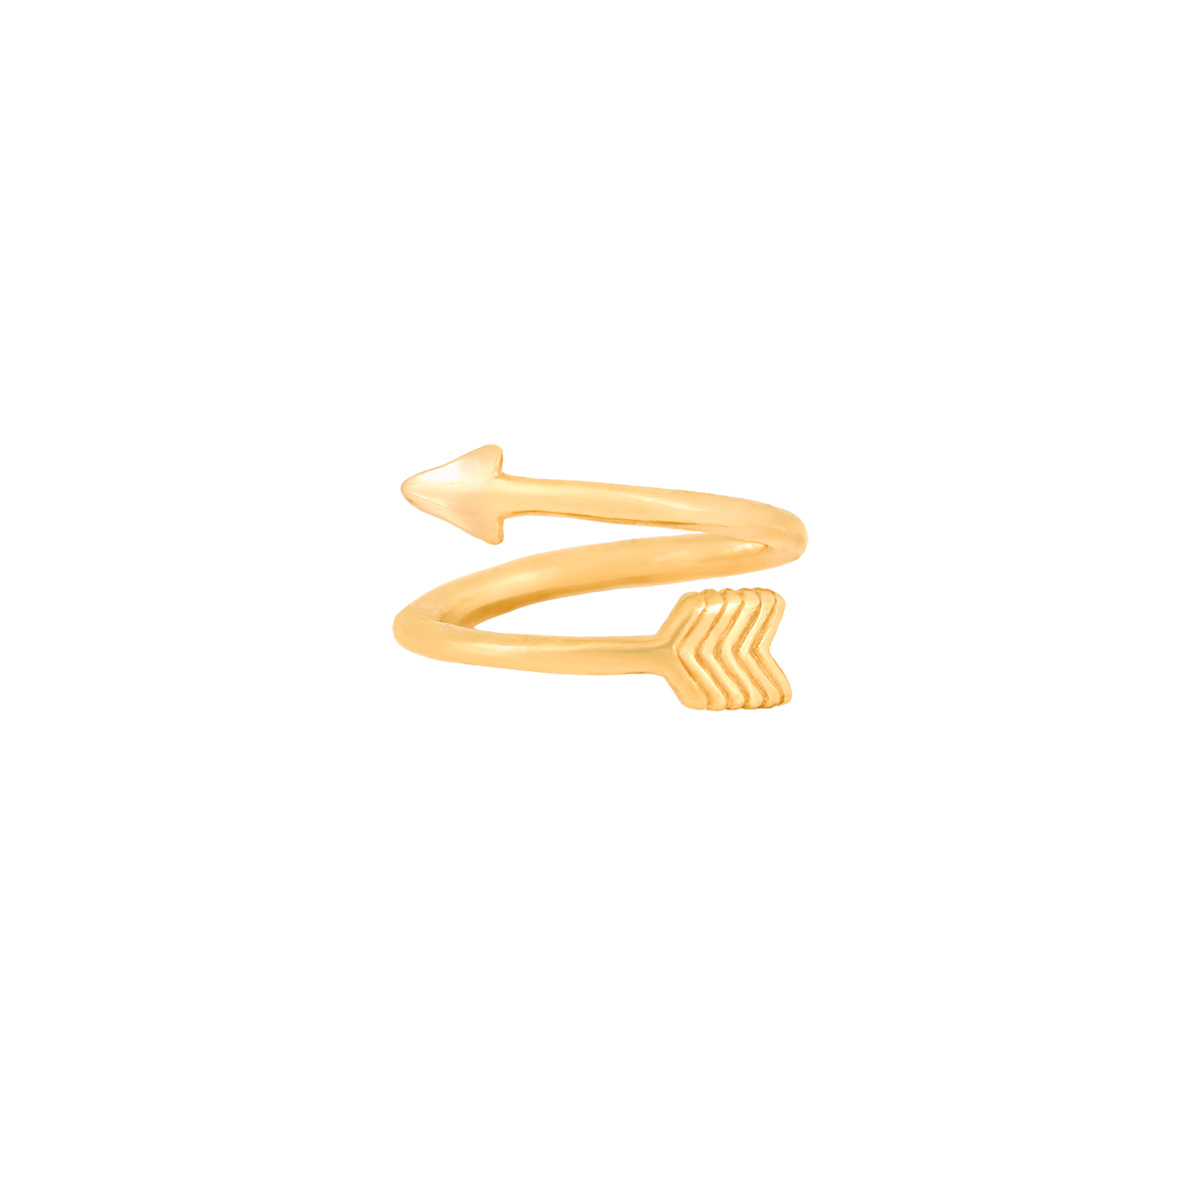 بند انگشتی طلا تیر